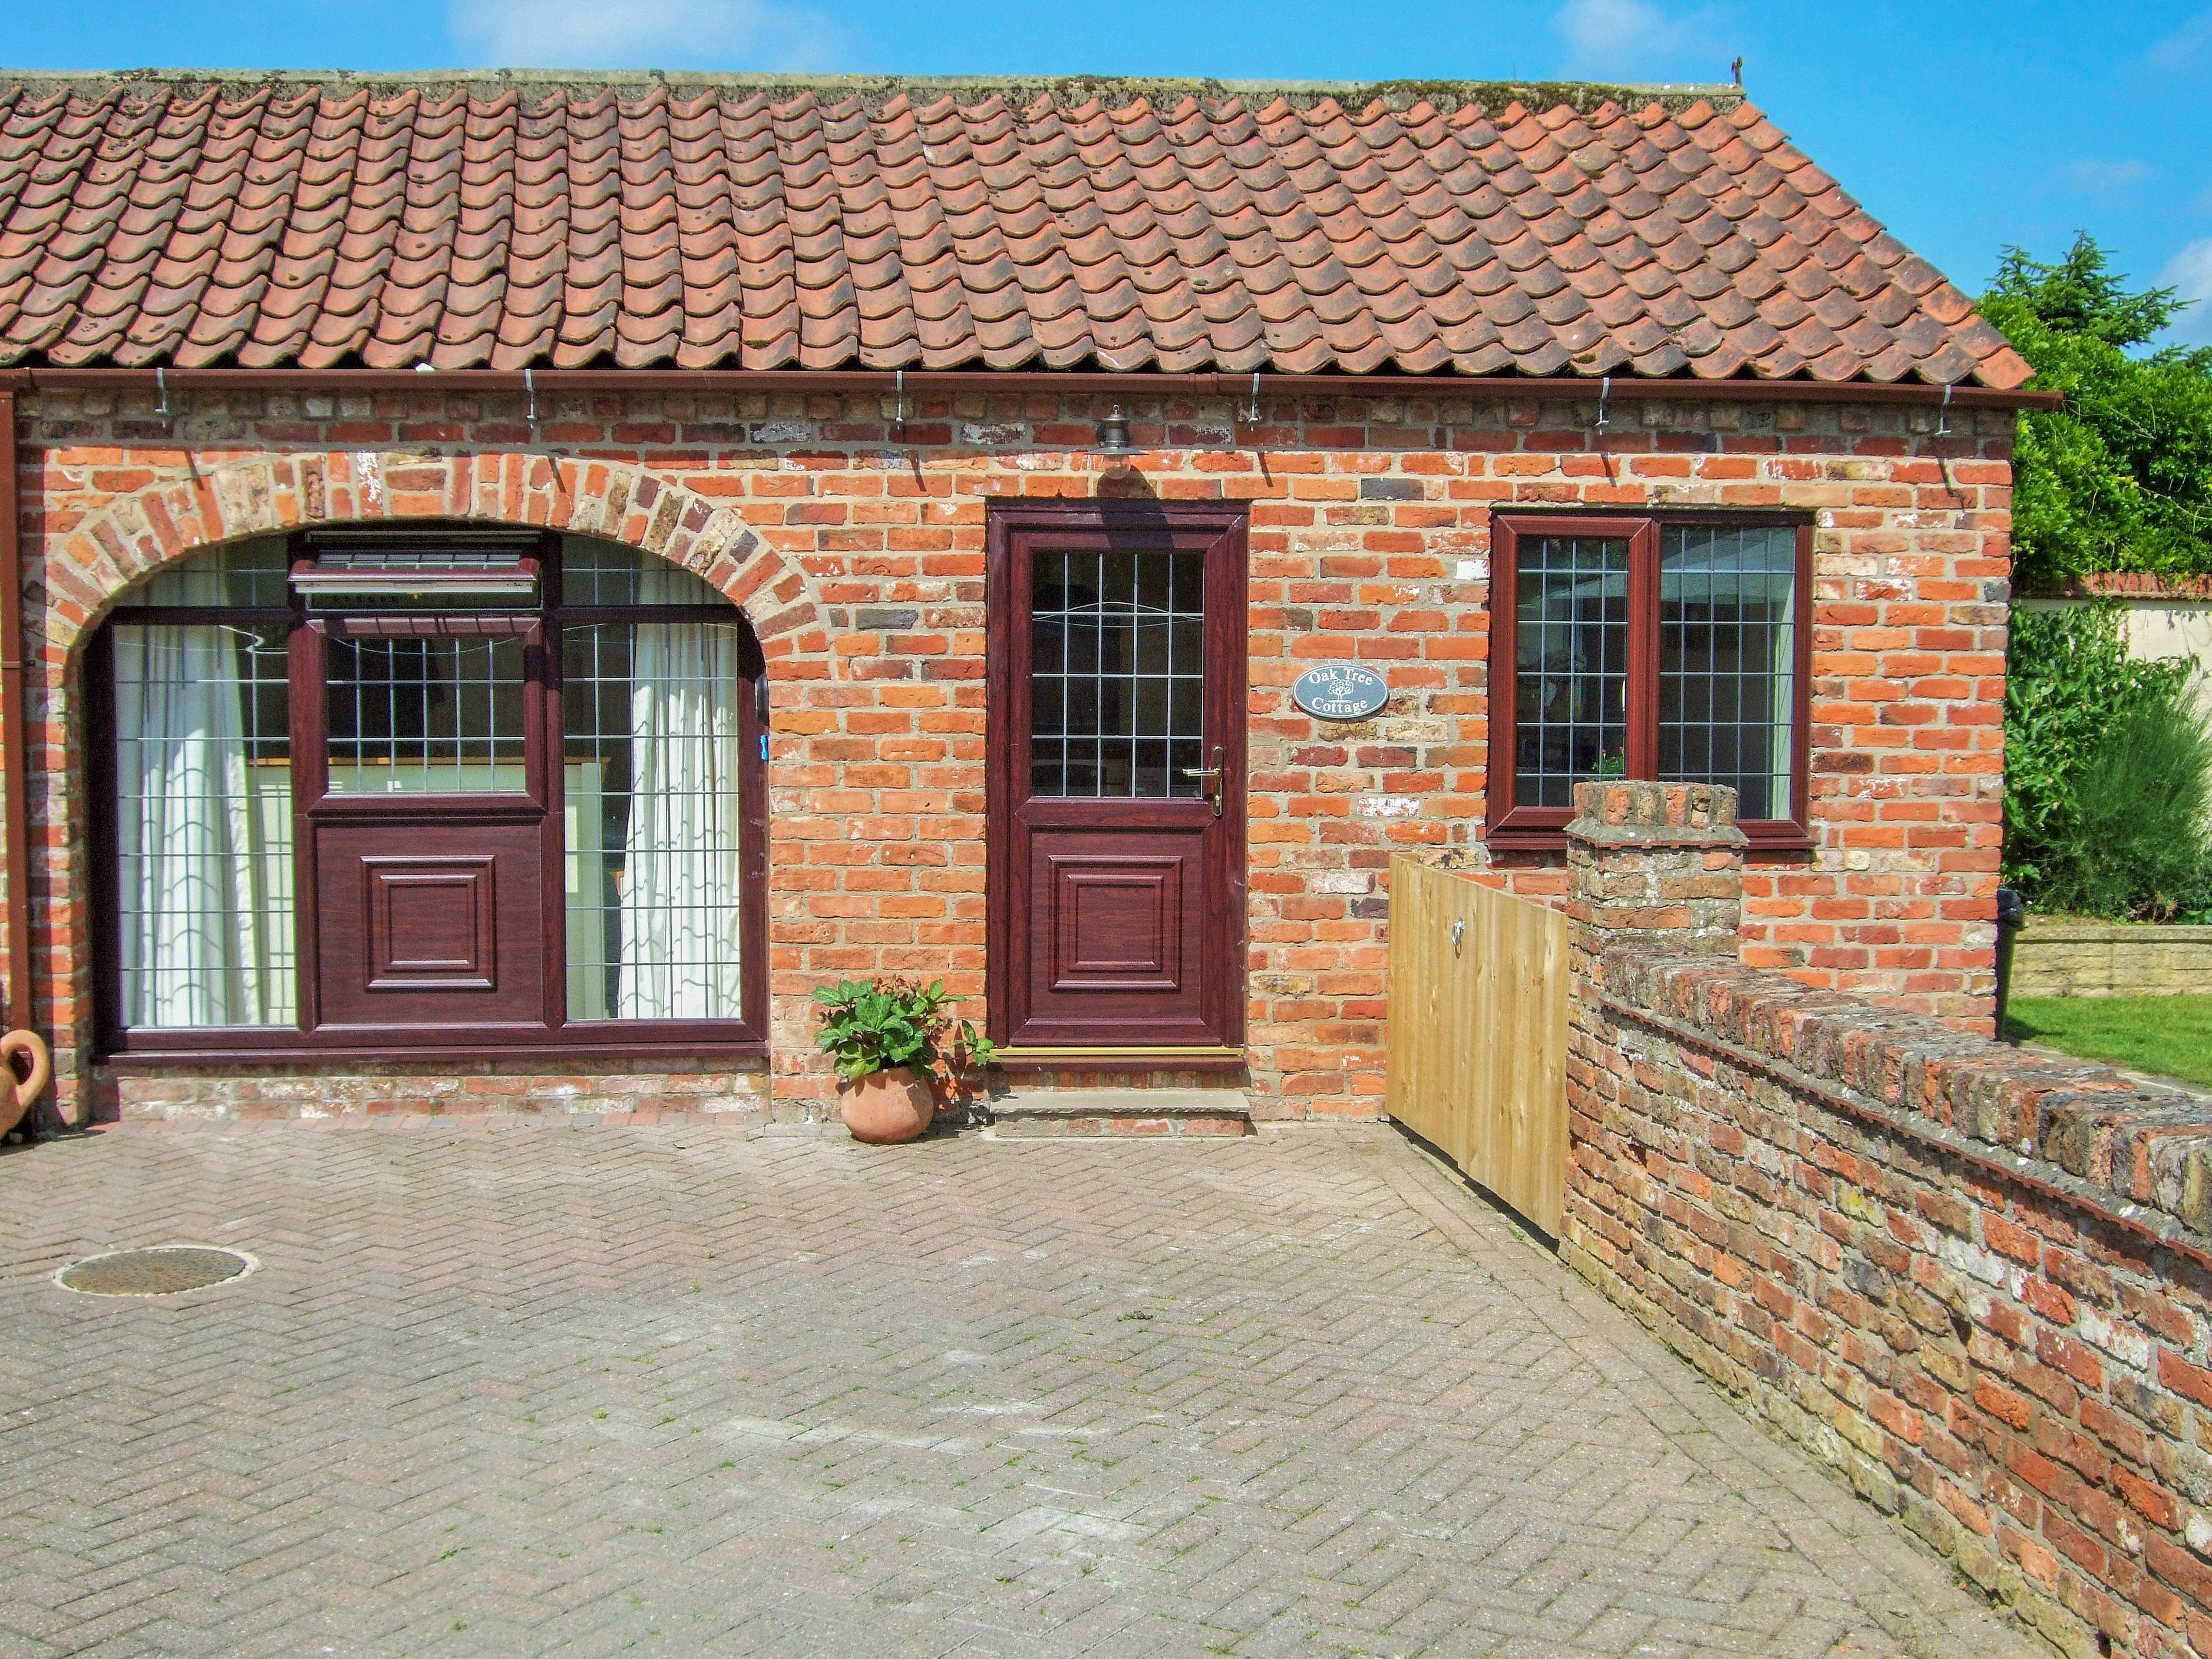 Oak Tree Cottage In Beverley Number 1 Is A Ground Floor